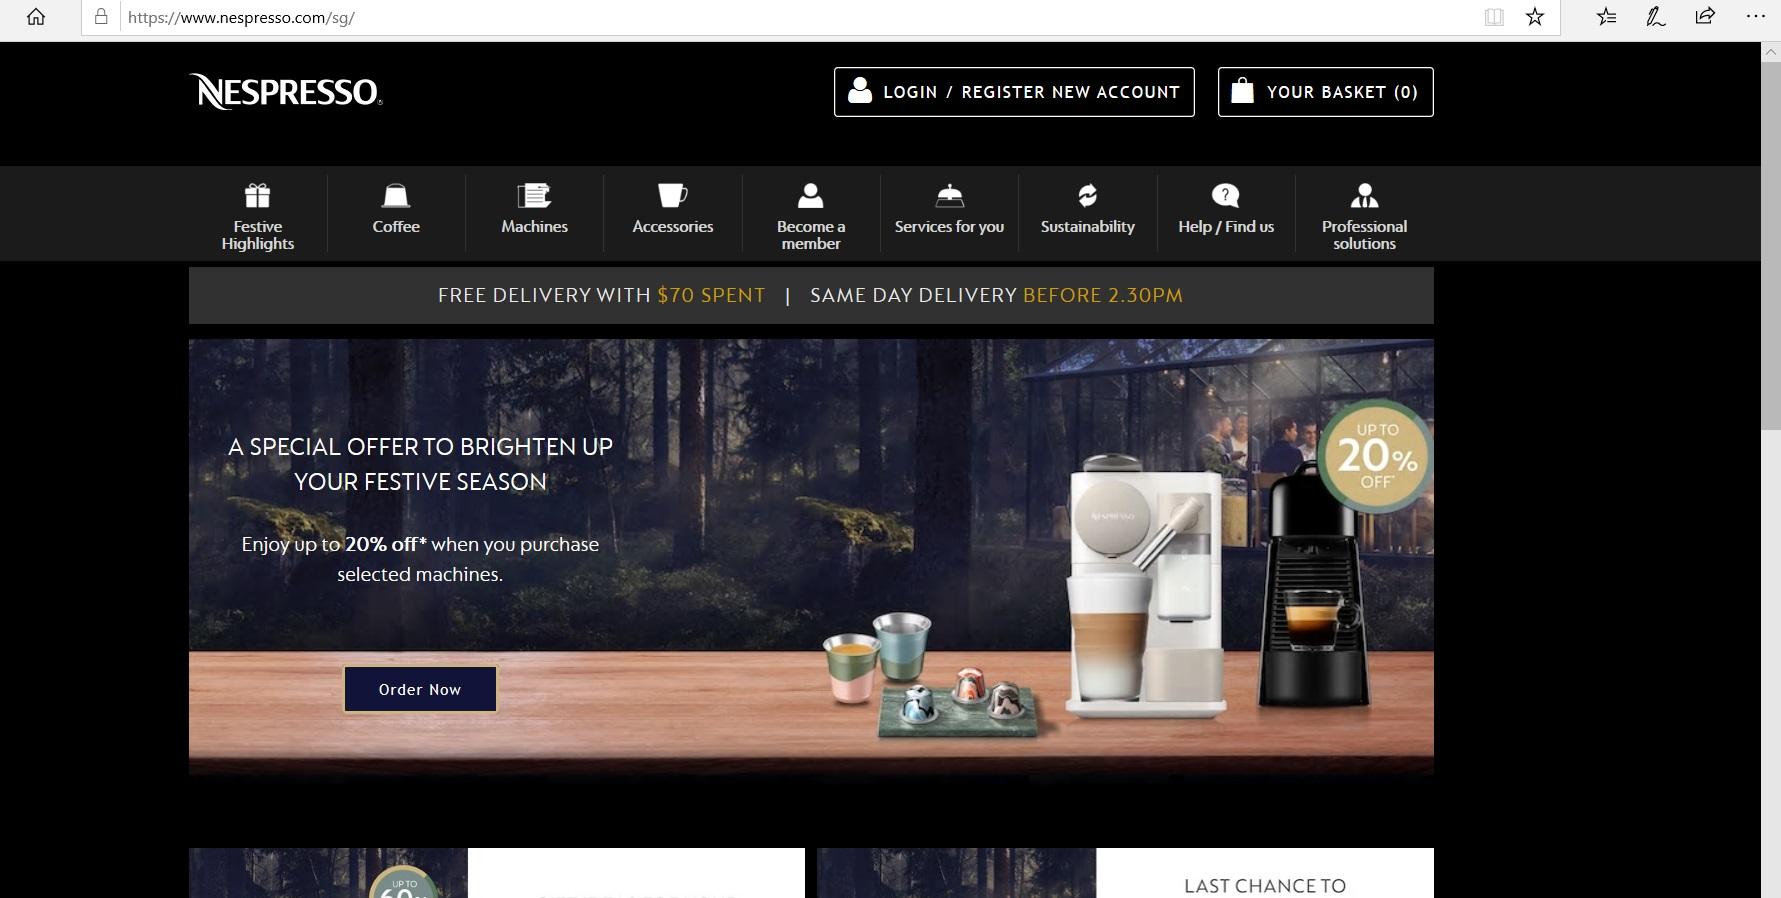 Nespresso website homepage.